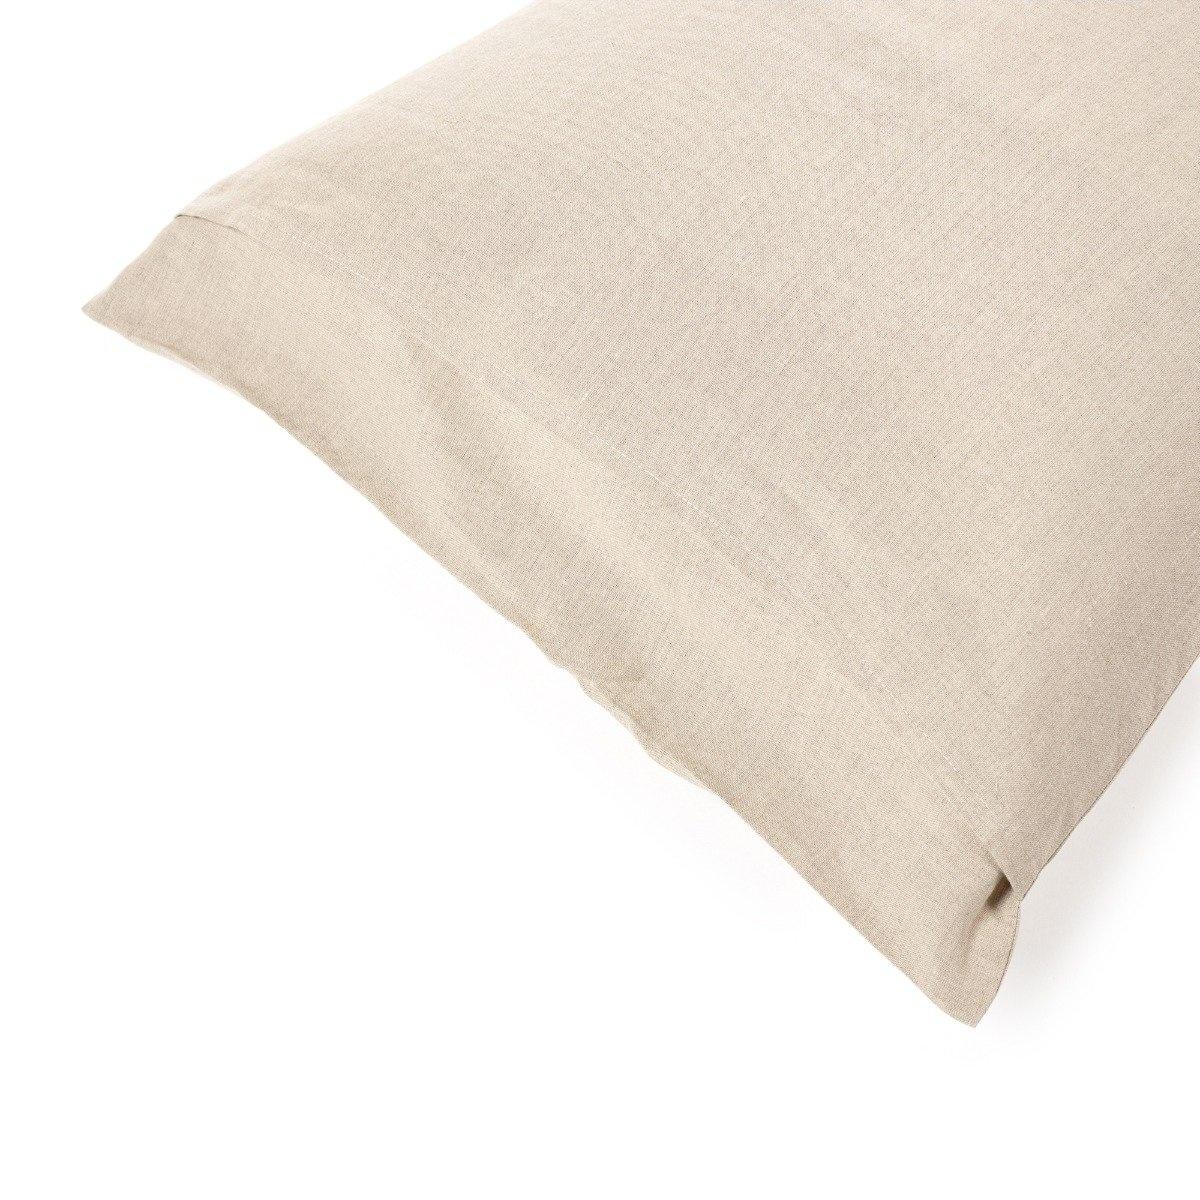 Pillow Sham - Heritage-4